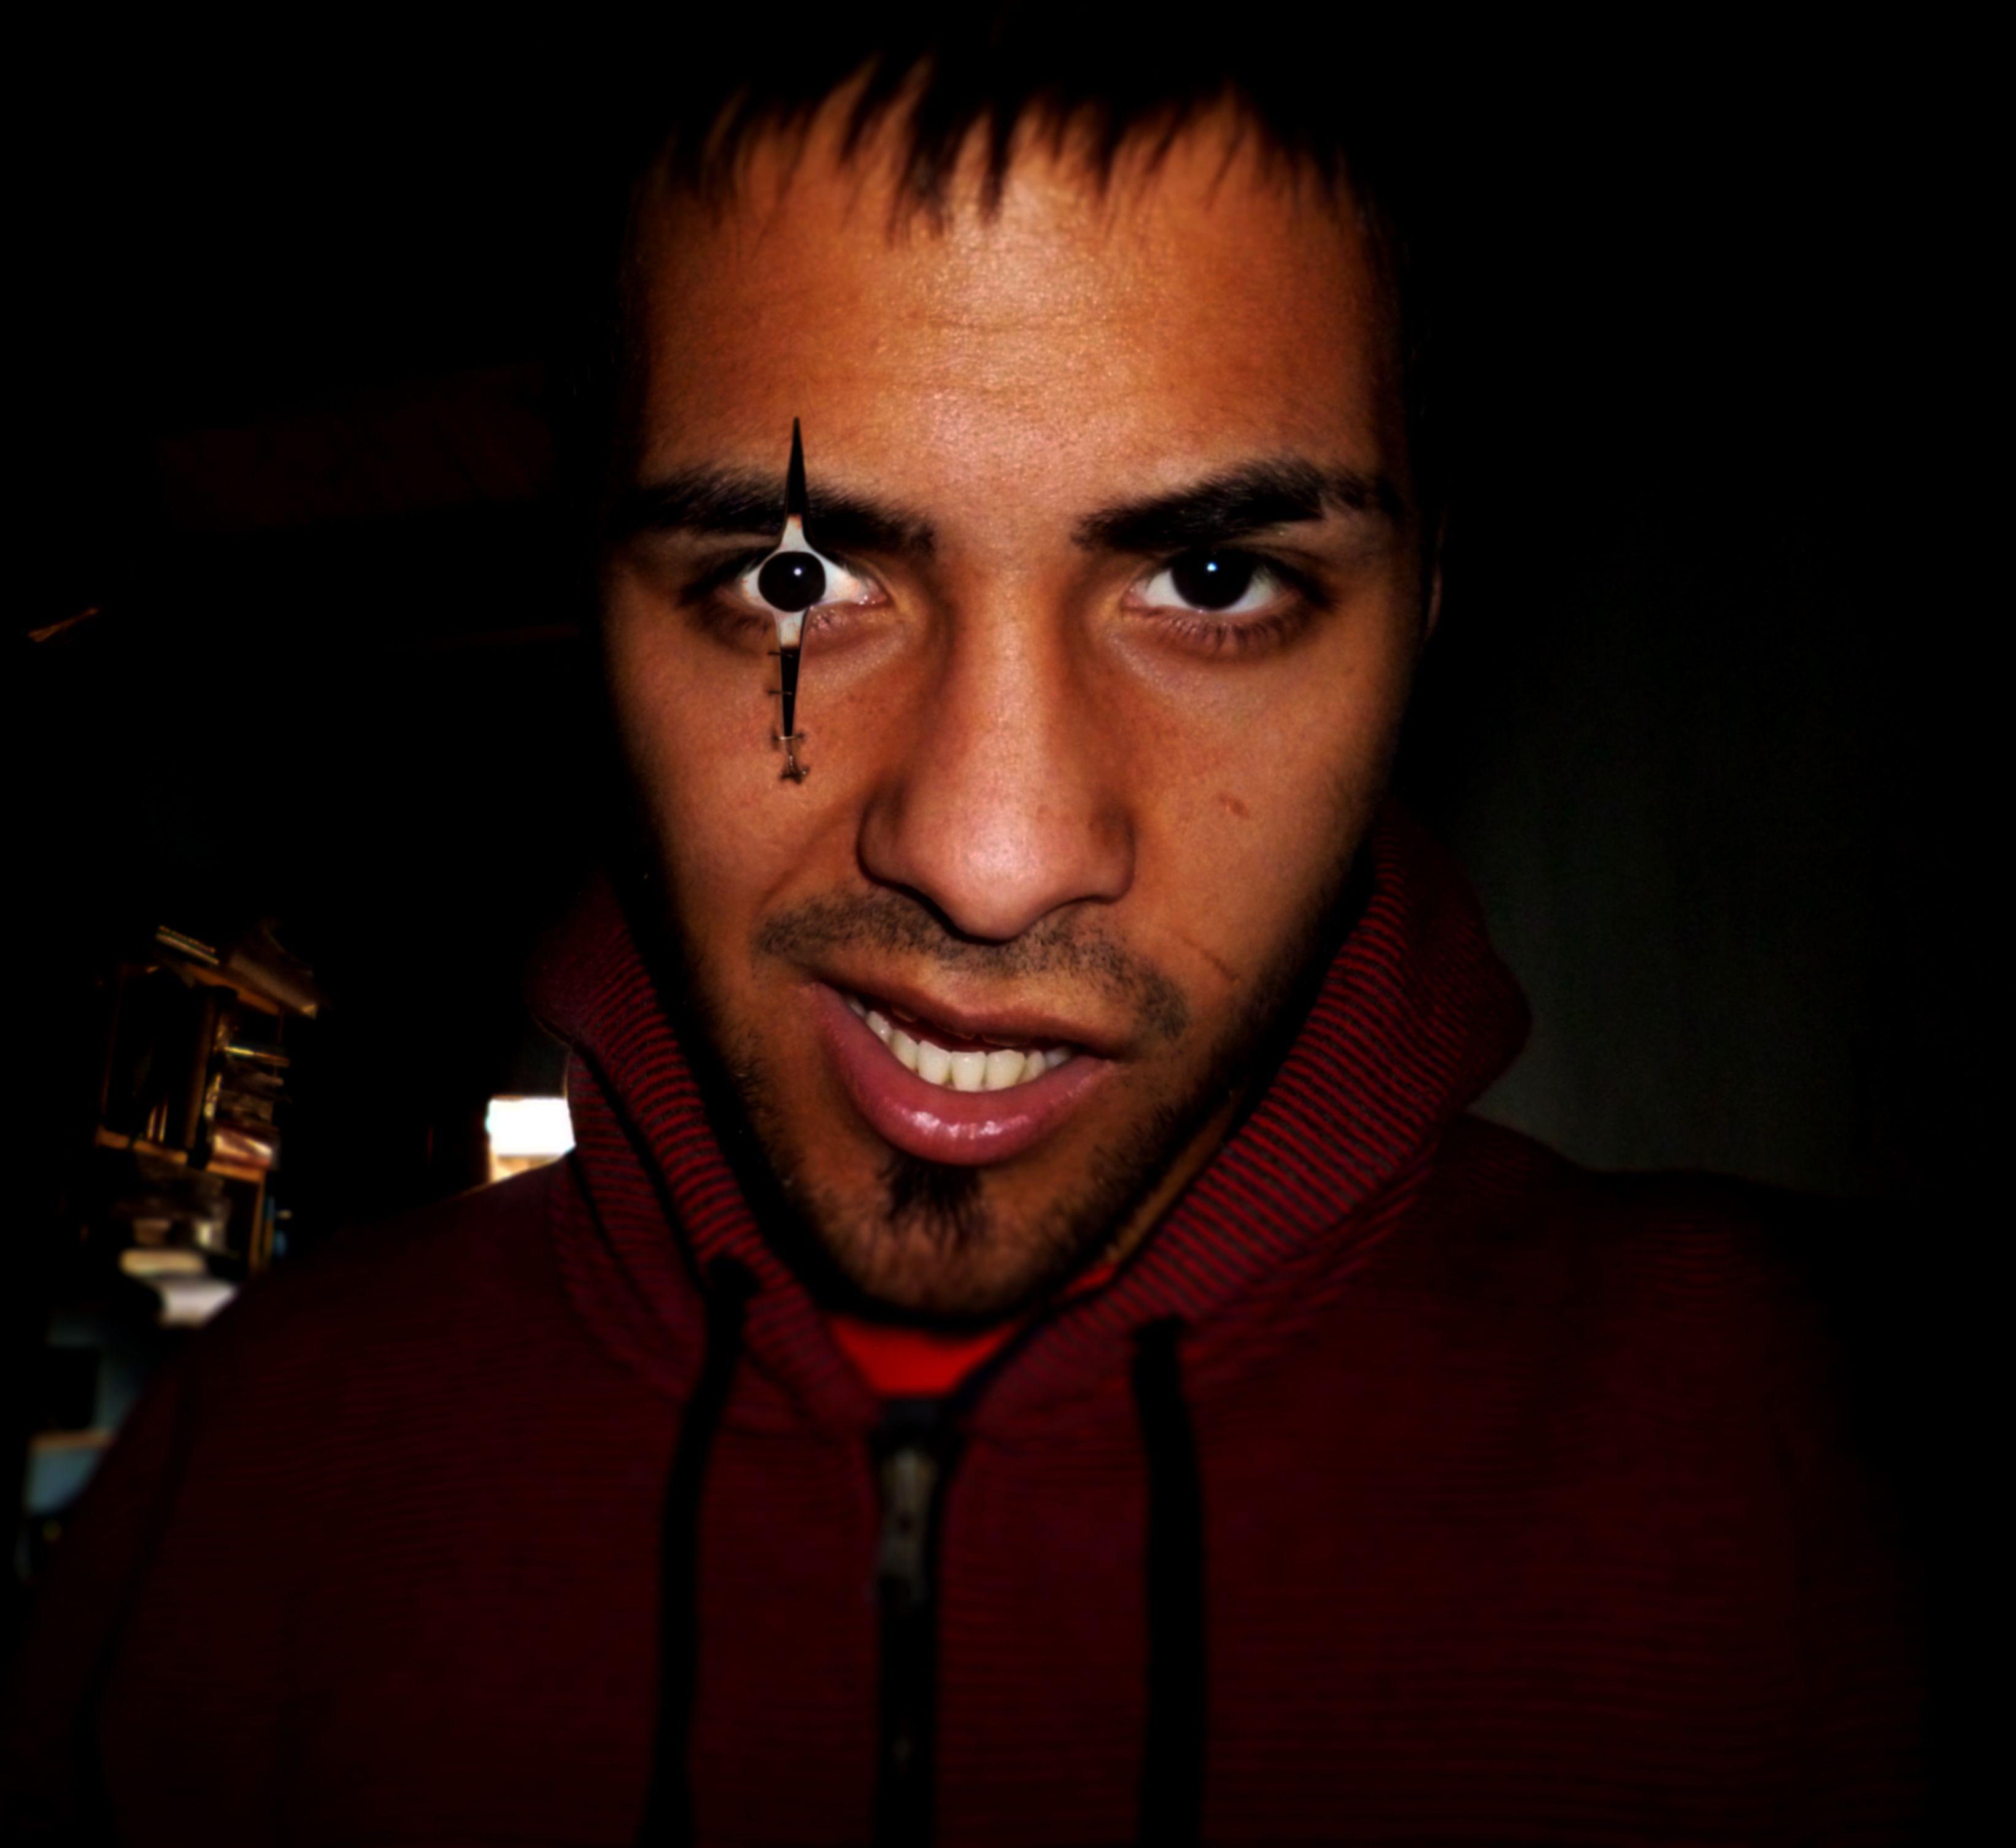 #Gaxppy #Photoshop #Manipulation #Horror #Terror #Devil